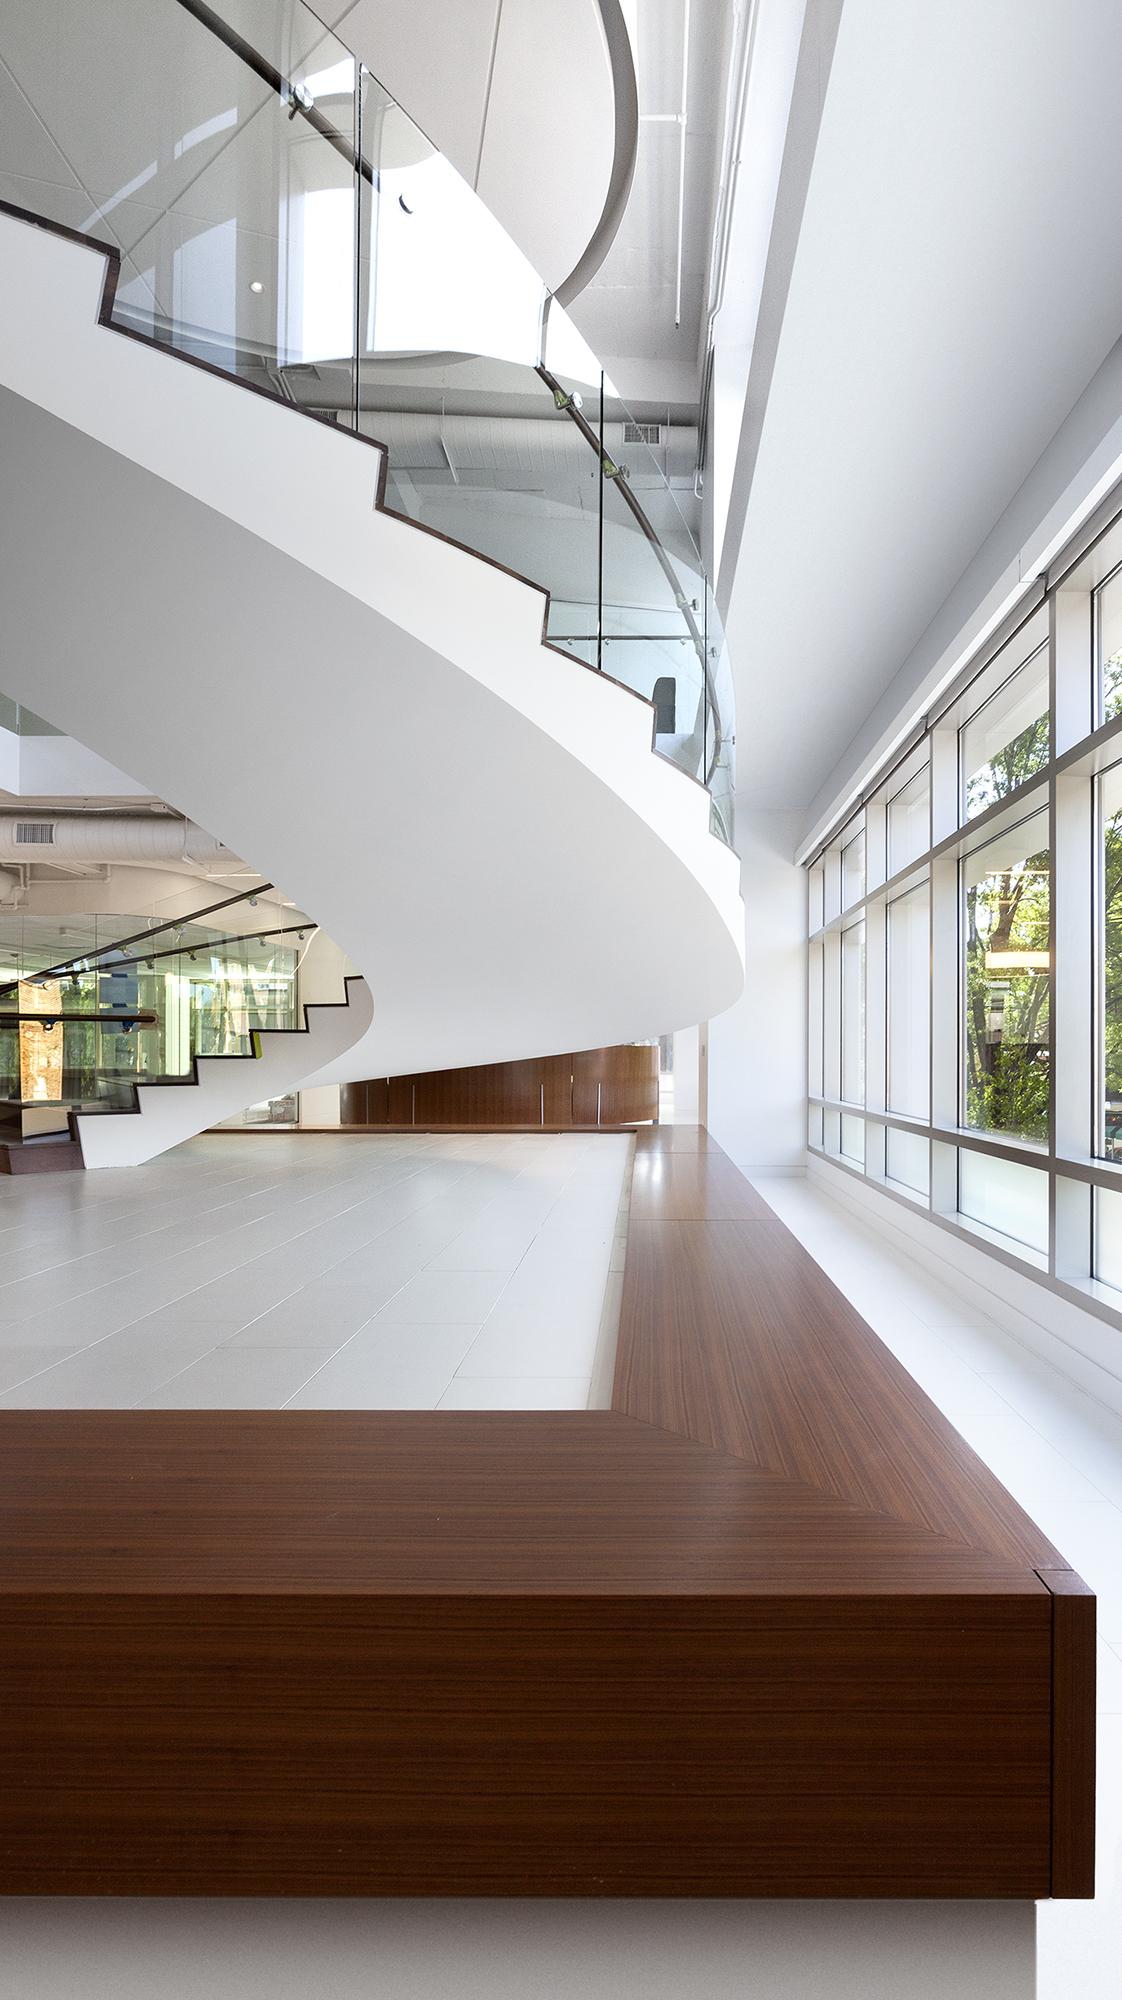 certusbank_headquarters_greenville_south_carolina_stair.jpg